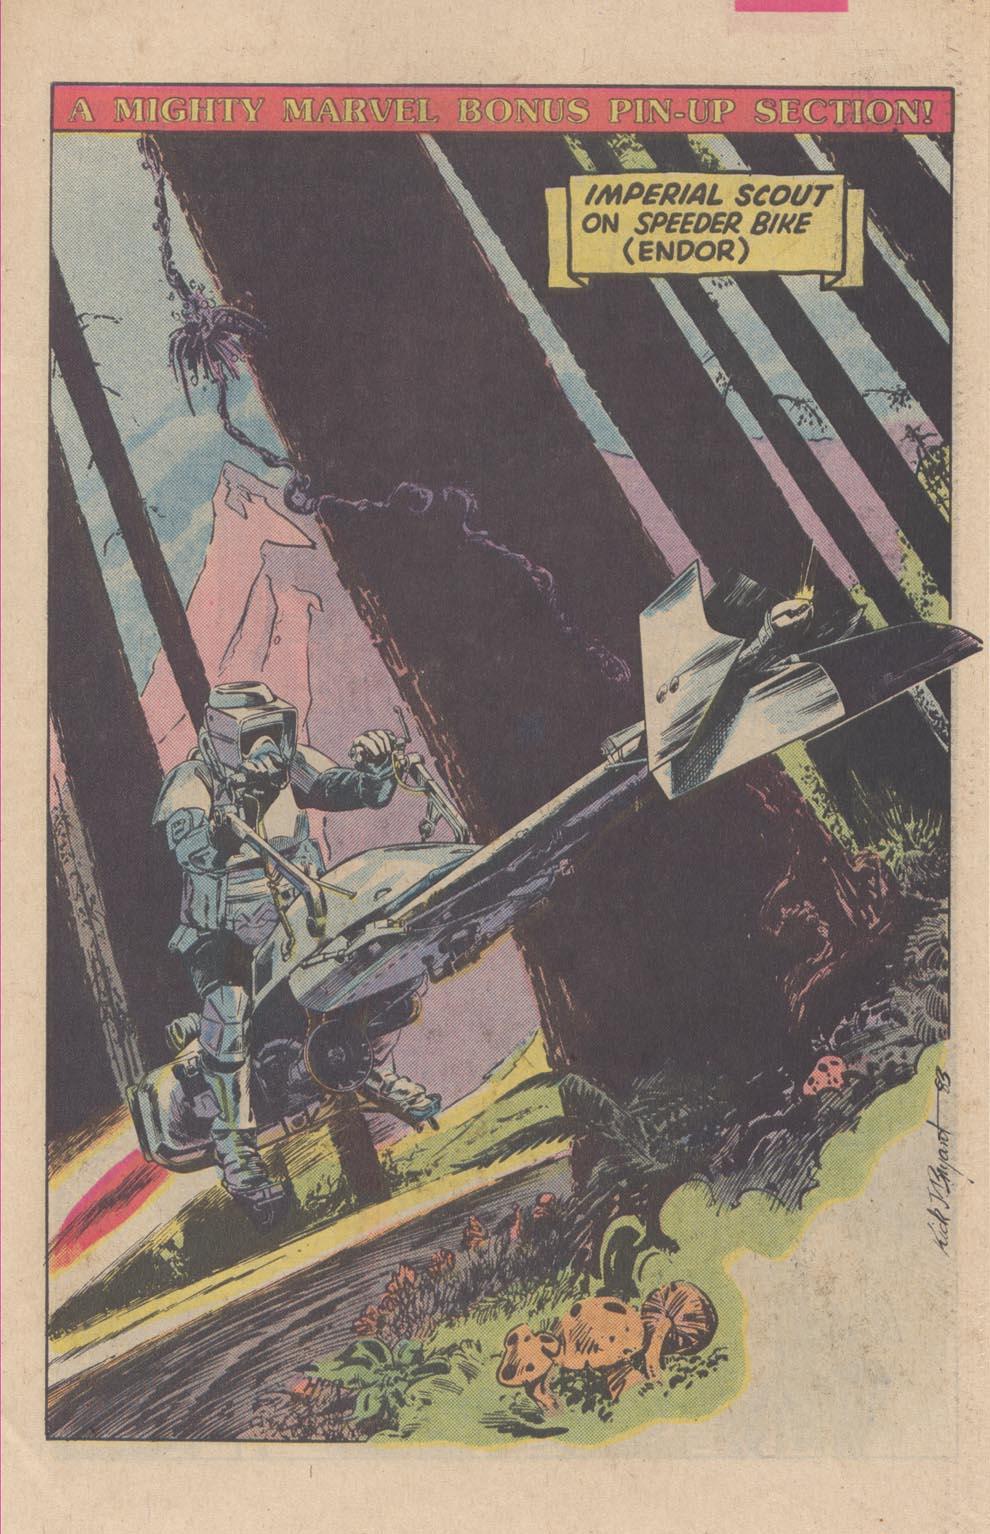 Read online Star Wars: Return of the Jedi comic -  Issue #3 - 21